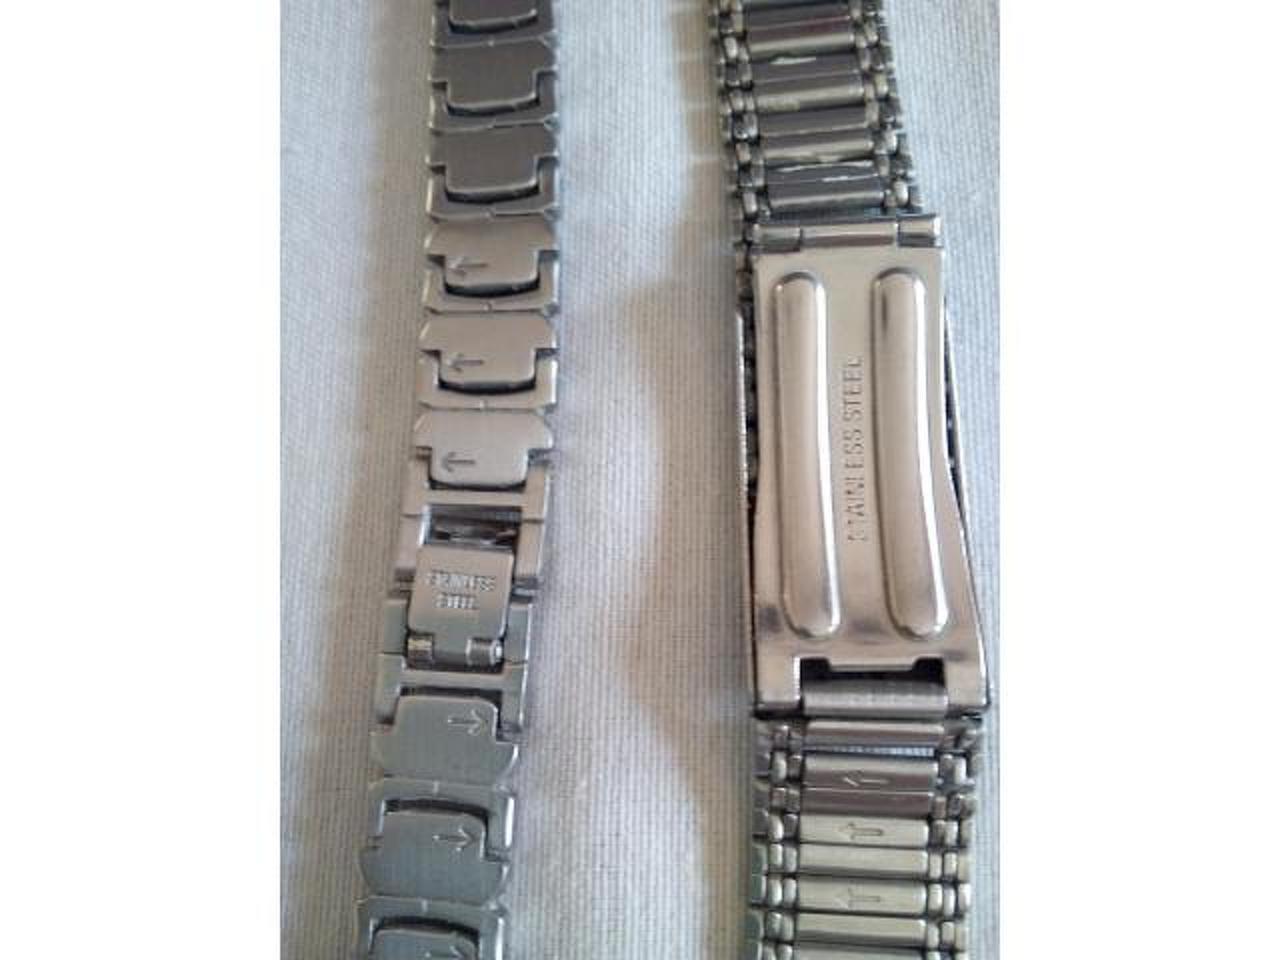 Braceletes para relógios, ajustáveis. - 2/3